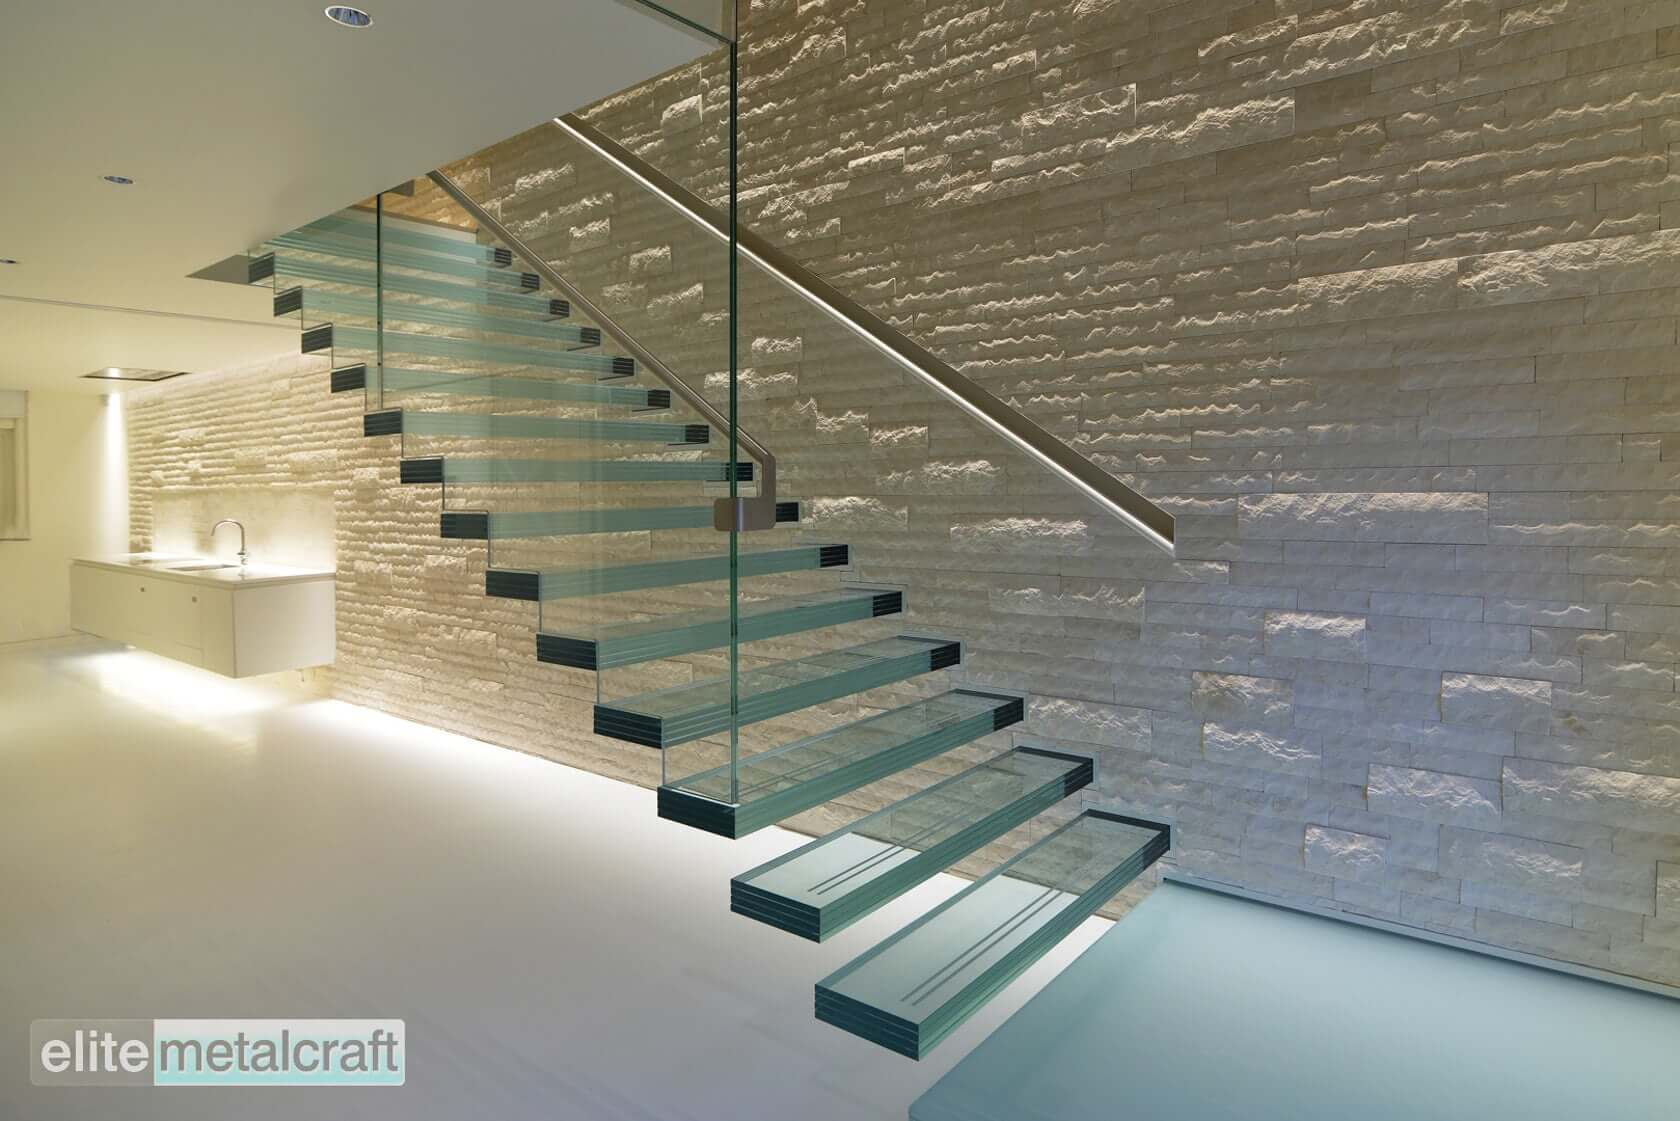 cam-basamaklı-merdiven